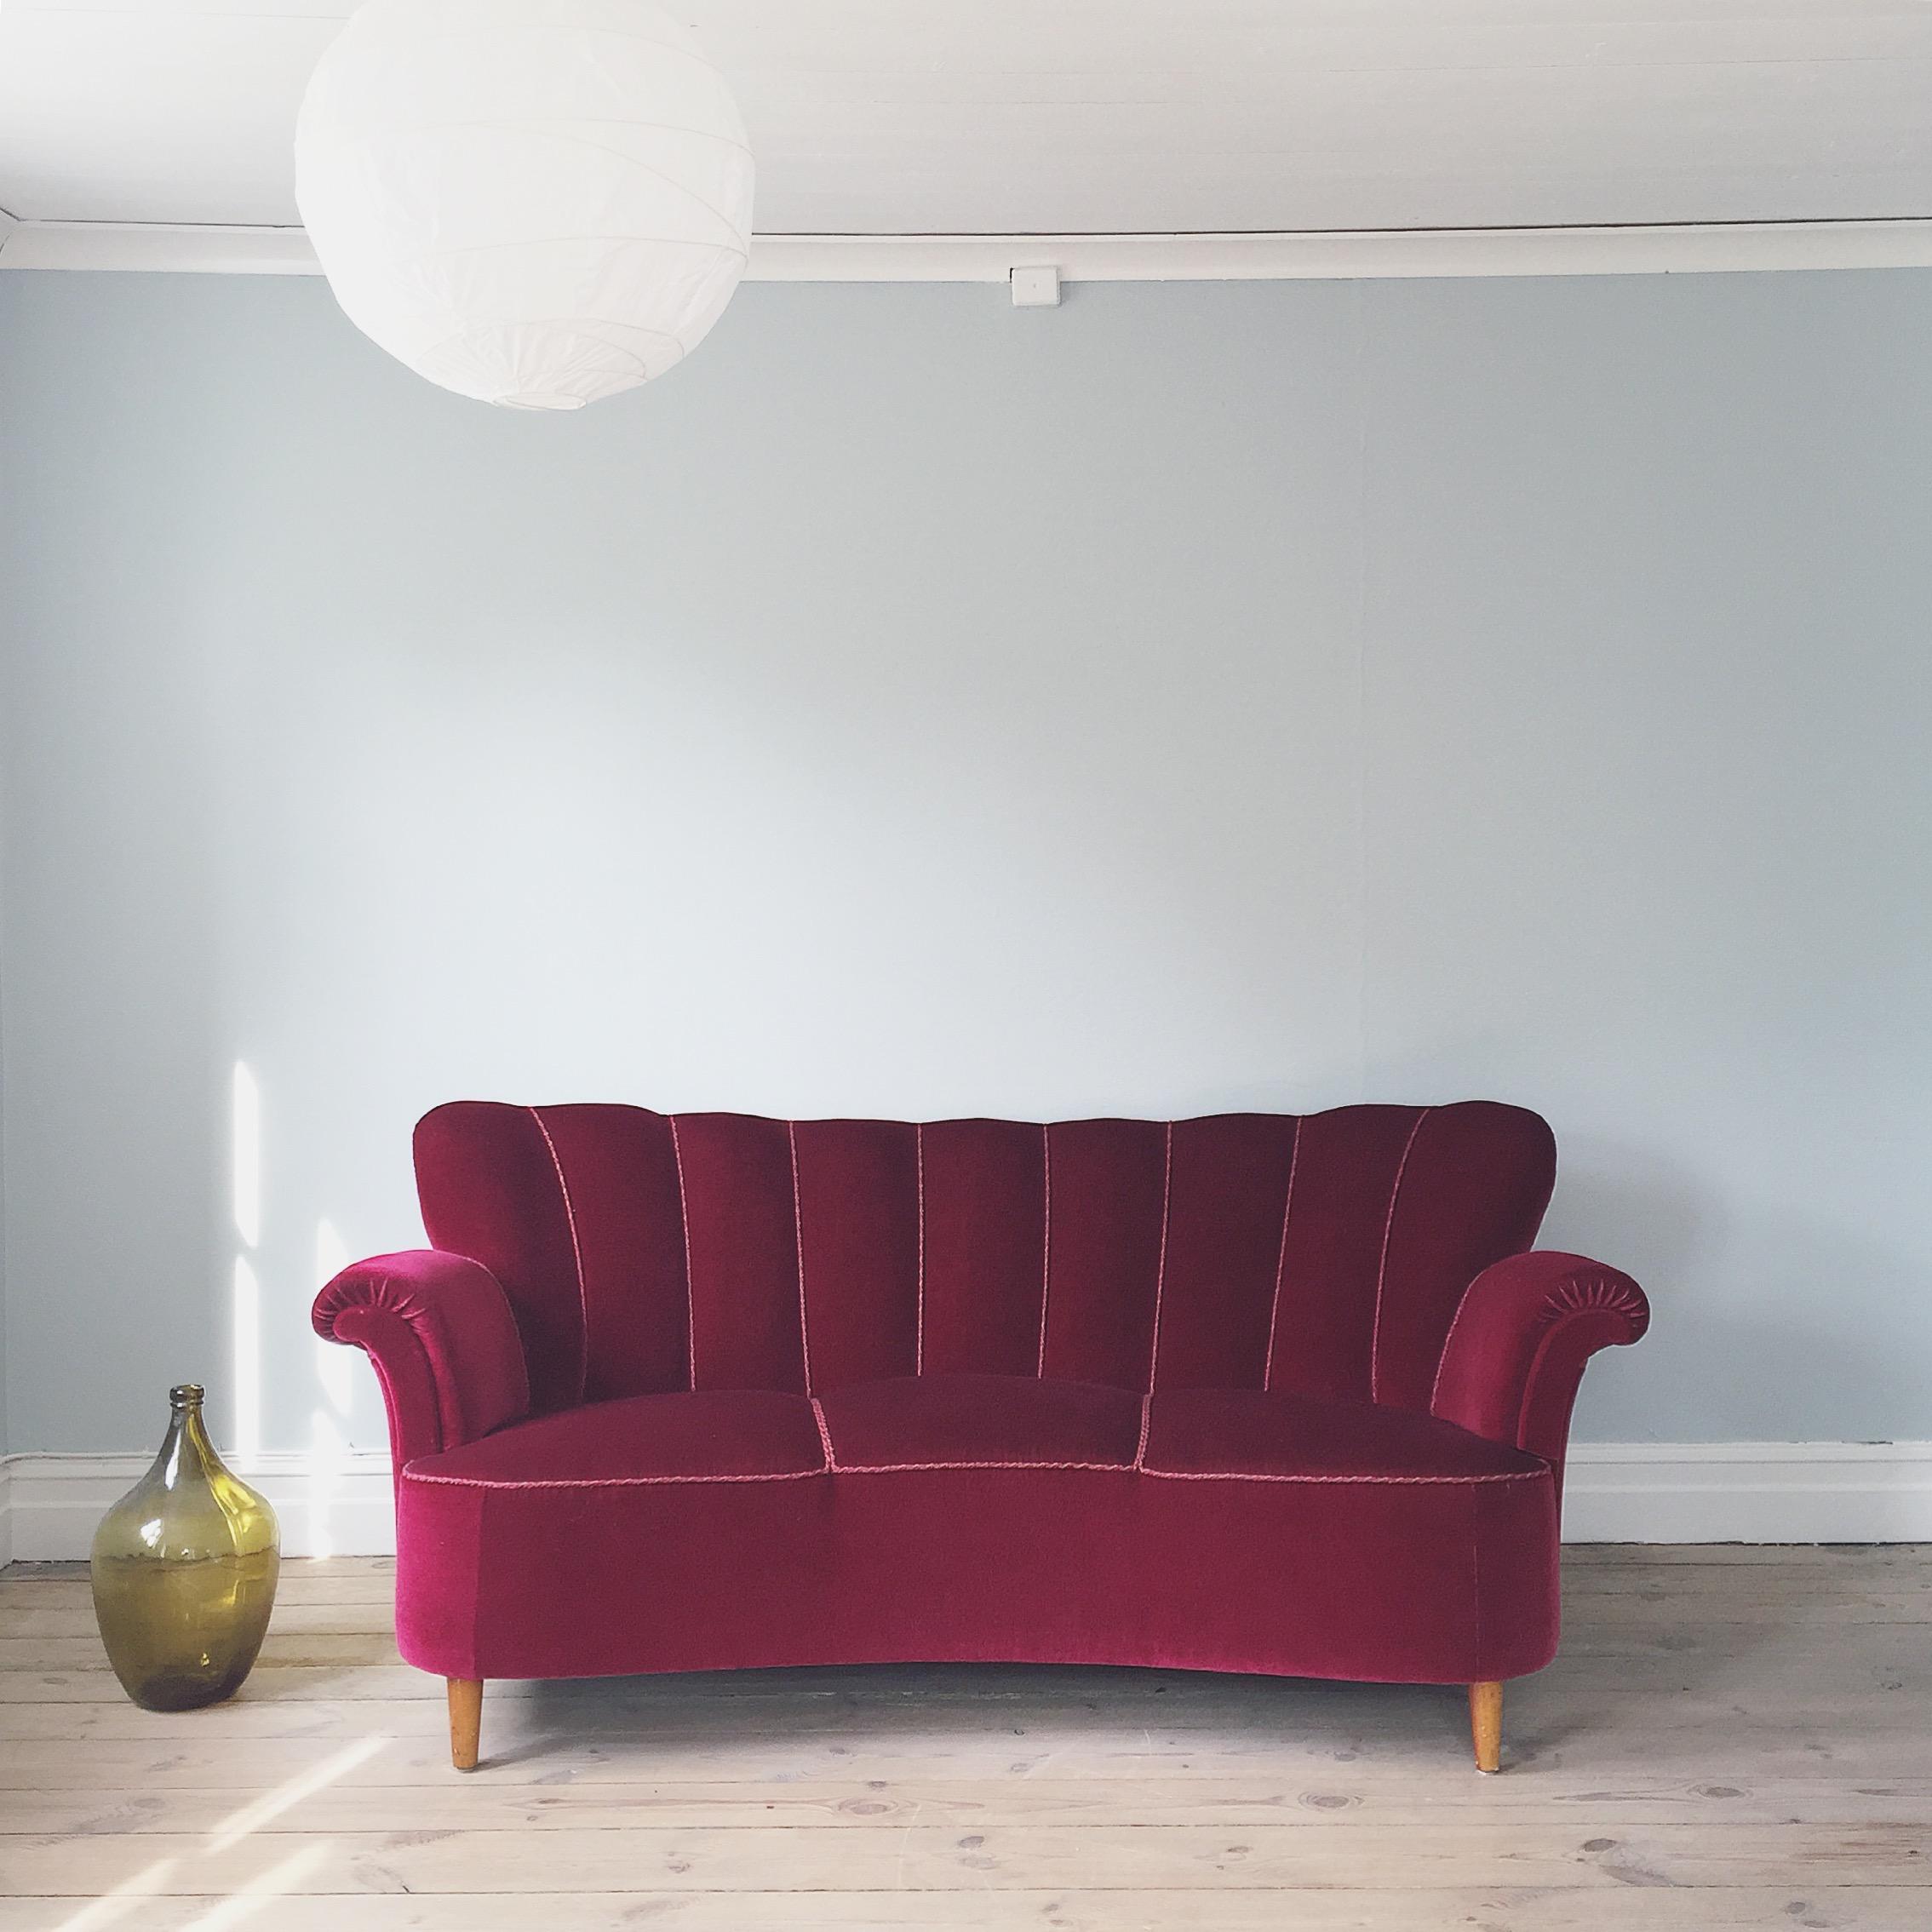 Visby Gotland torp soffa inredning vardagsrum vintage